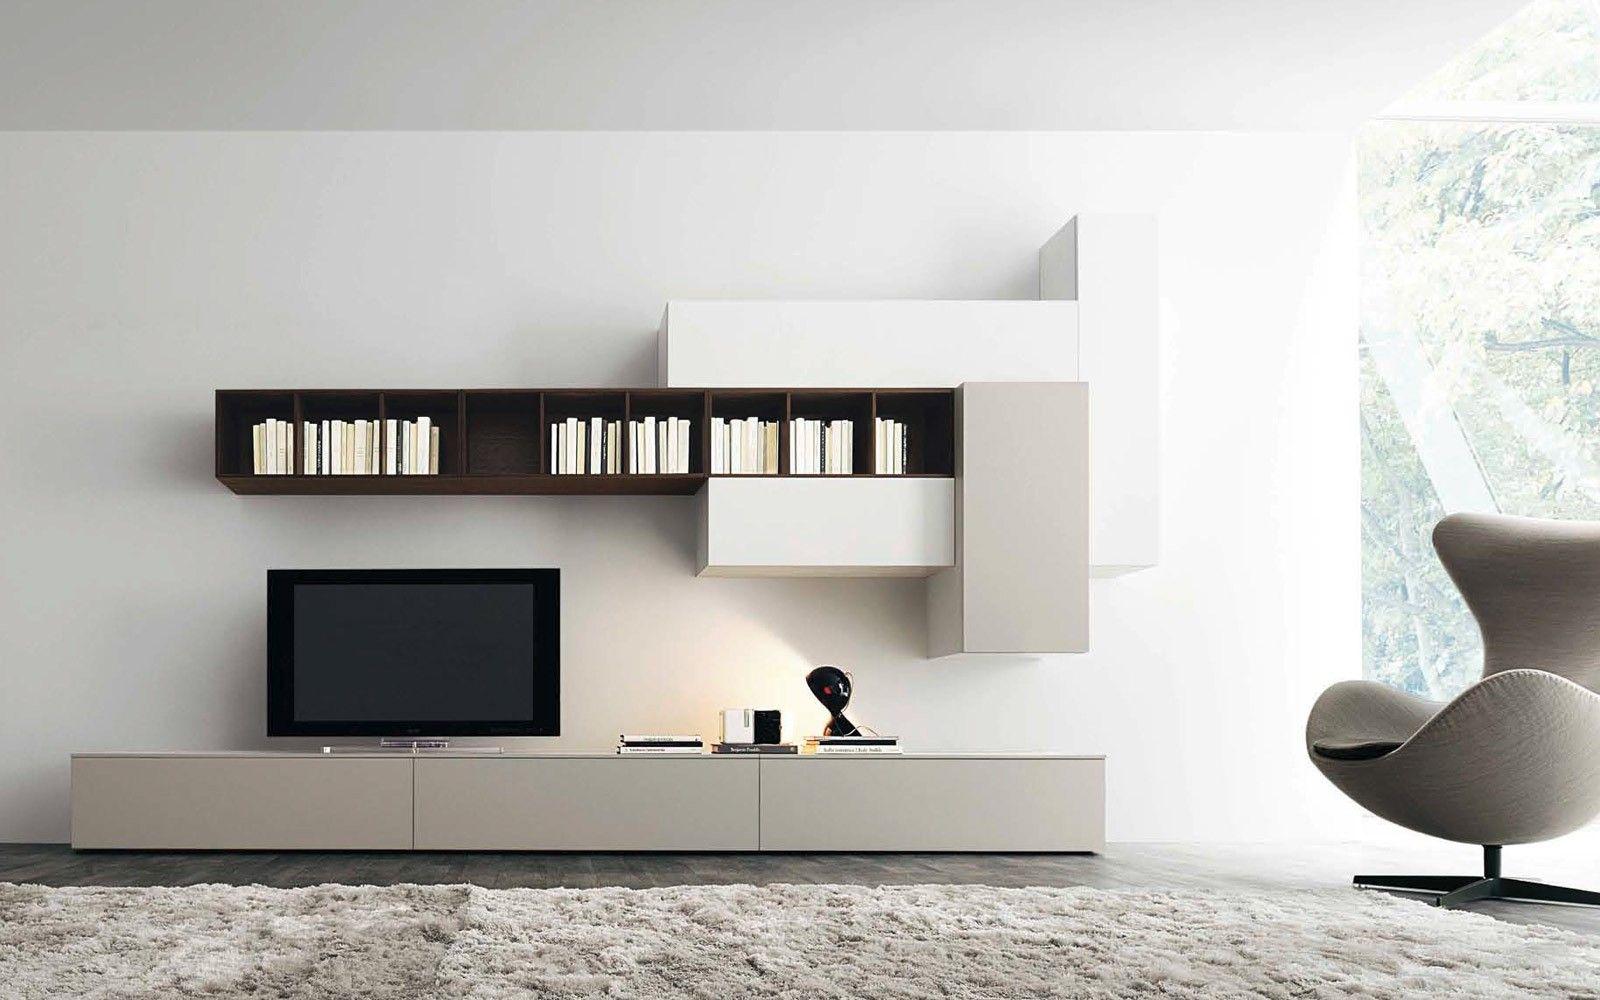 Wohnwand design wand  Die besten 25+ Tv wand lampo Ideen auf Pinterest | Tv wohnwand, Tv ...